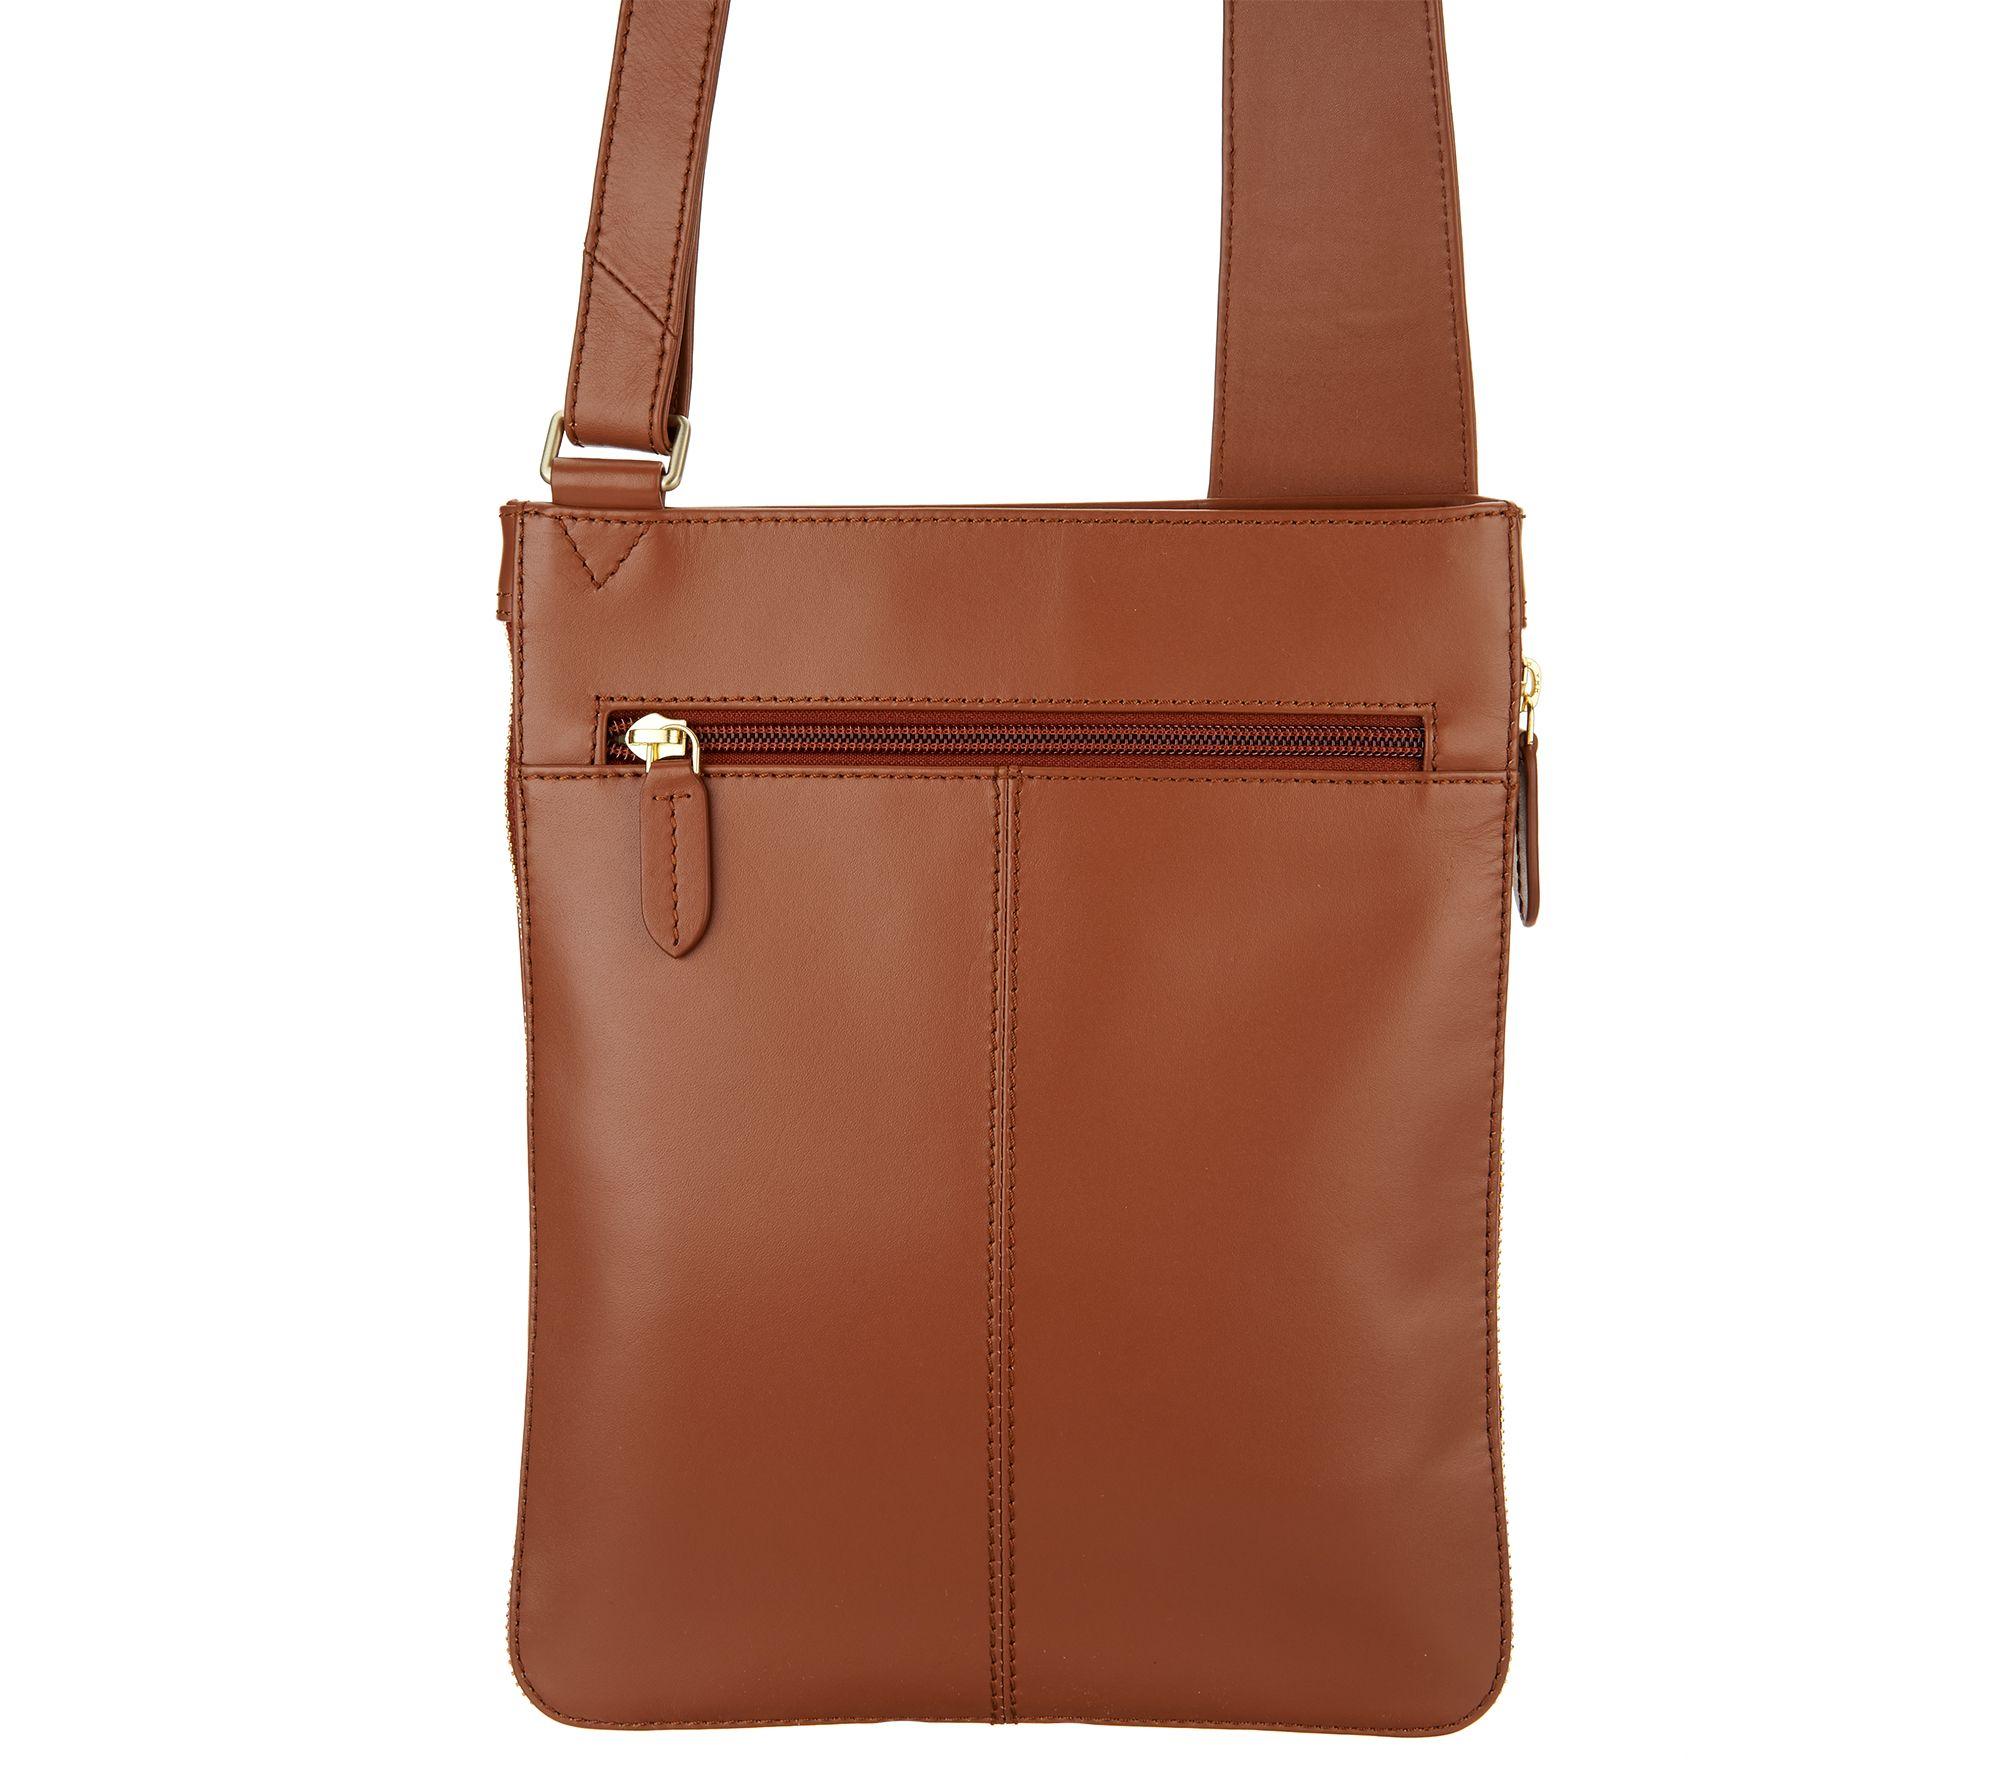 RADLEY London Medium Pockets Leather Crossbody Handbag - Page 1 — QVC.com 80e665eafc8fd